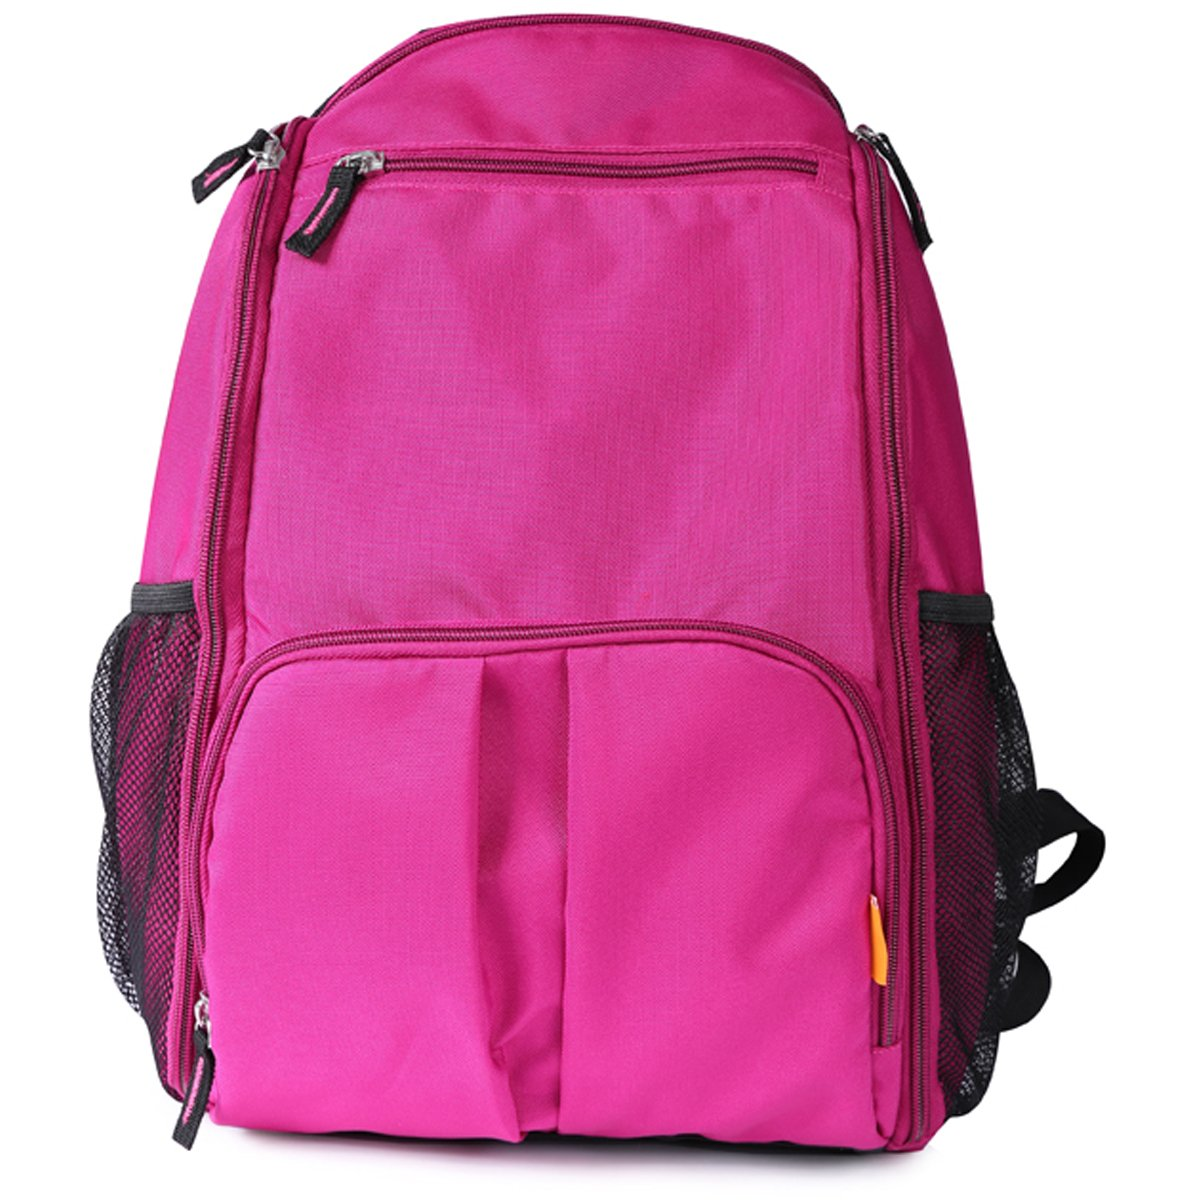 Heine 海恩多功能双肩背妈咪包YA10087紫色(18个口袋;附送隔尿垫、奶嘴袋、收纳袋)